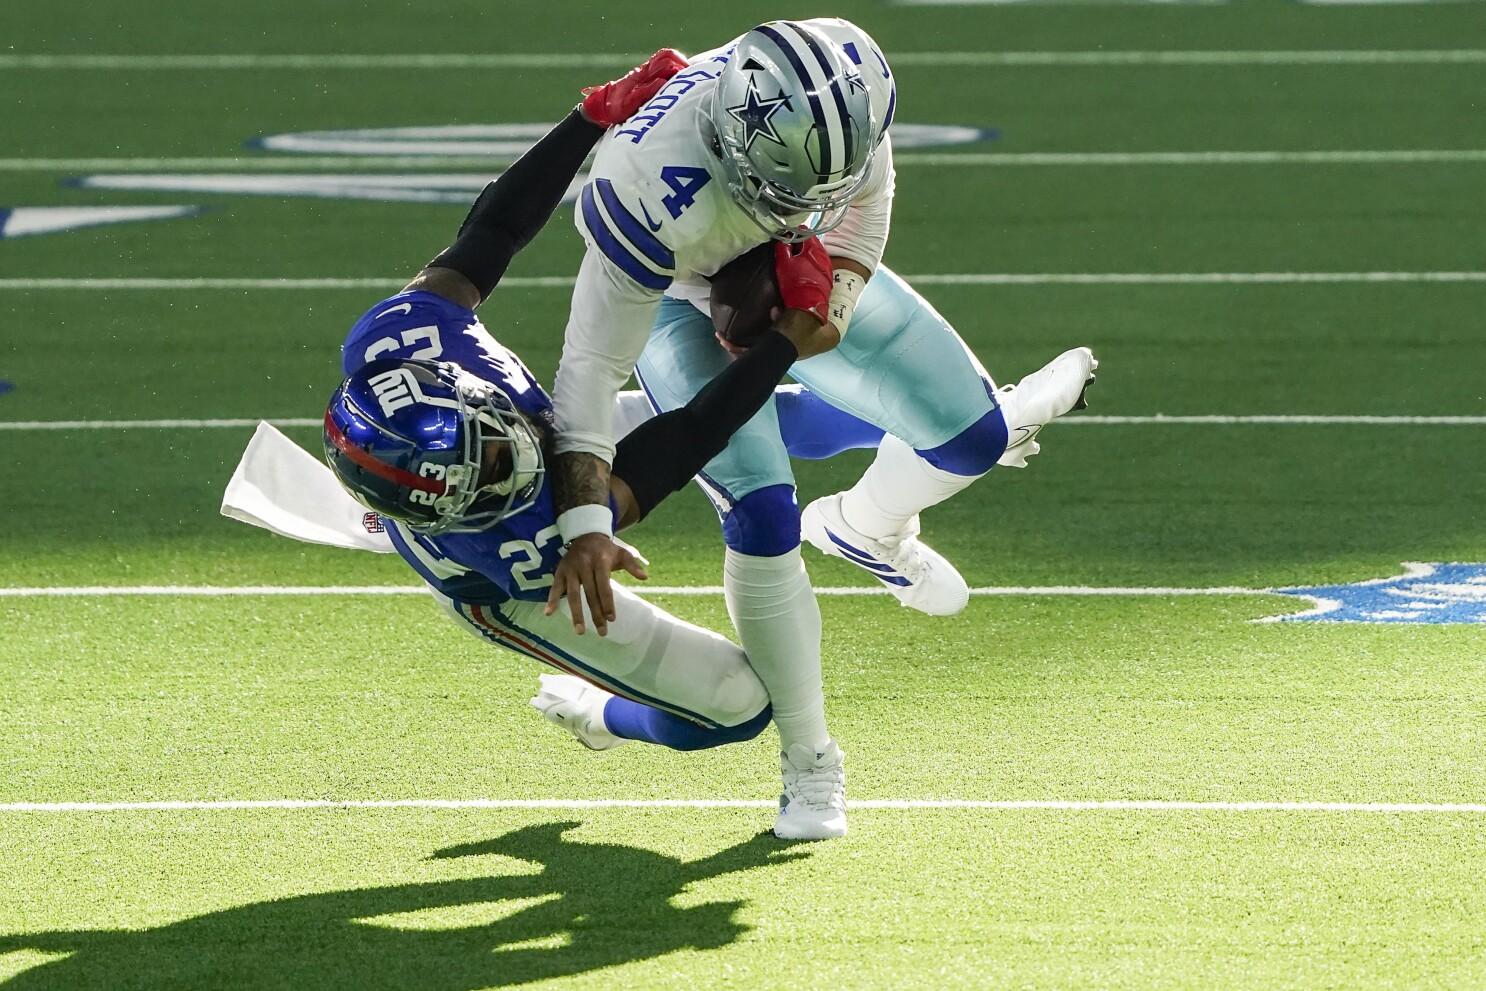 Prescott Injured Dalton Leads Cowboys Past Giants The San Diego Union Tribune